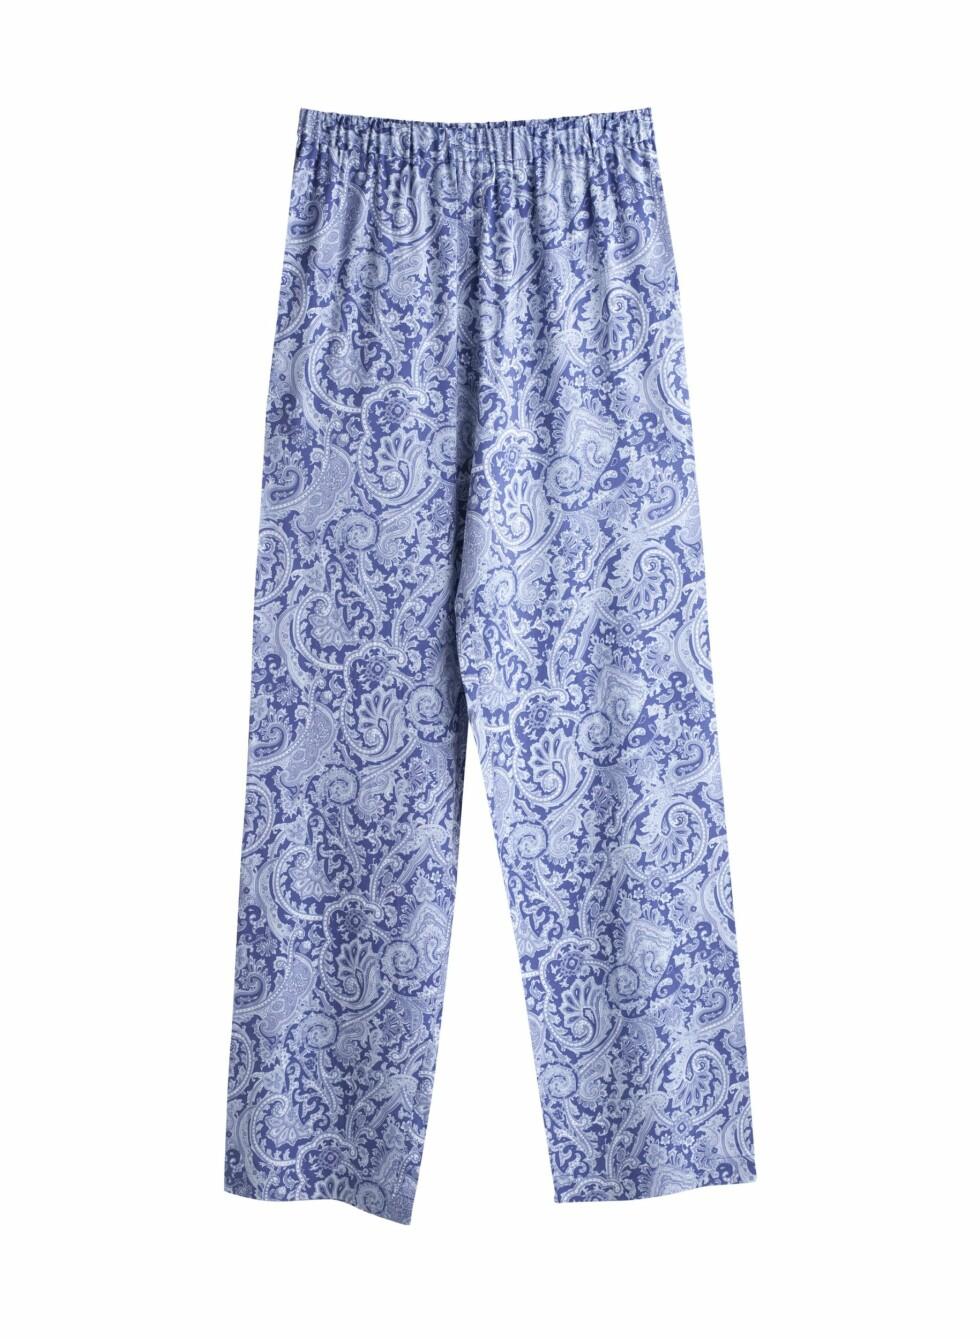 Vide bukser med mønster (kr 450, Weekday). Foto: Produsenten